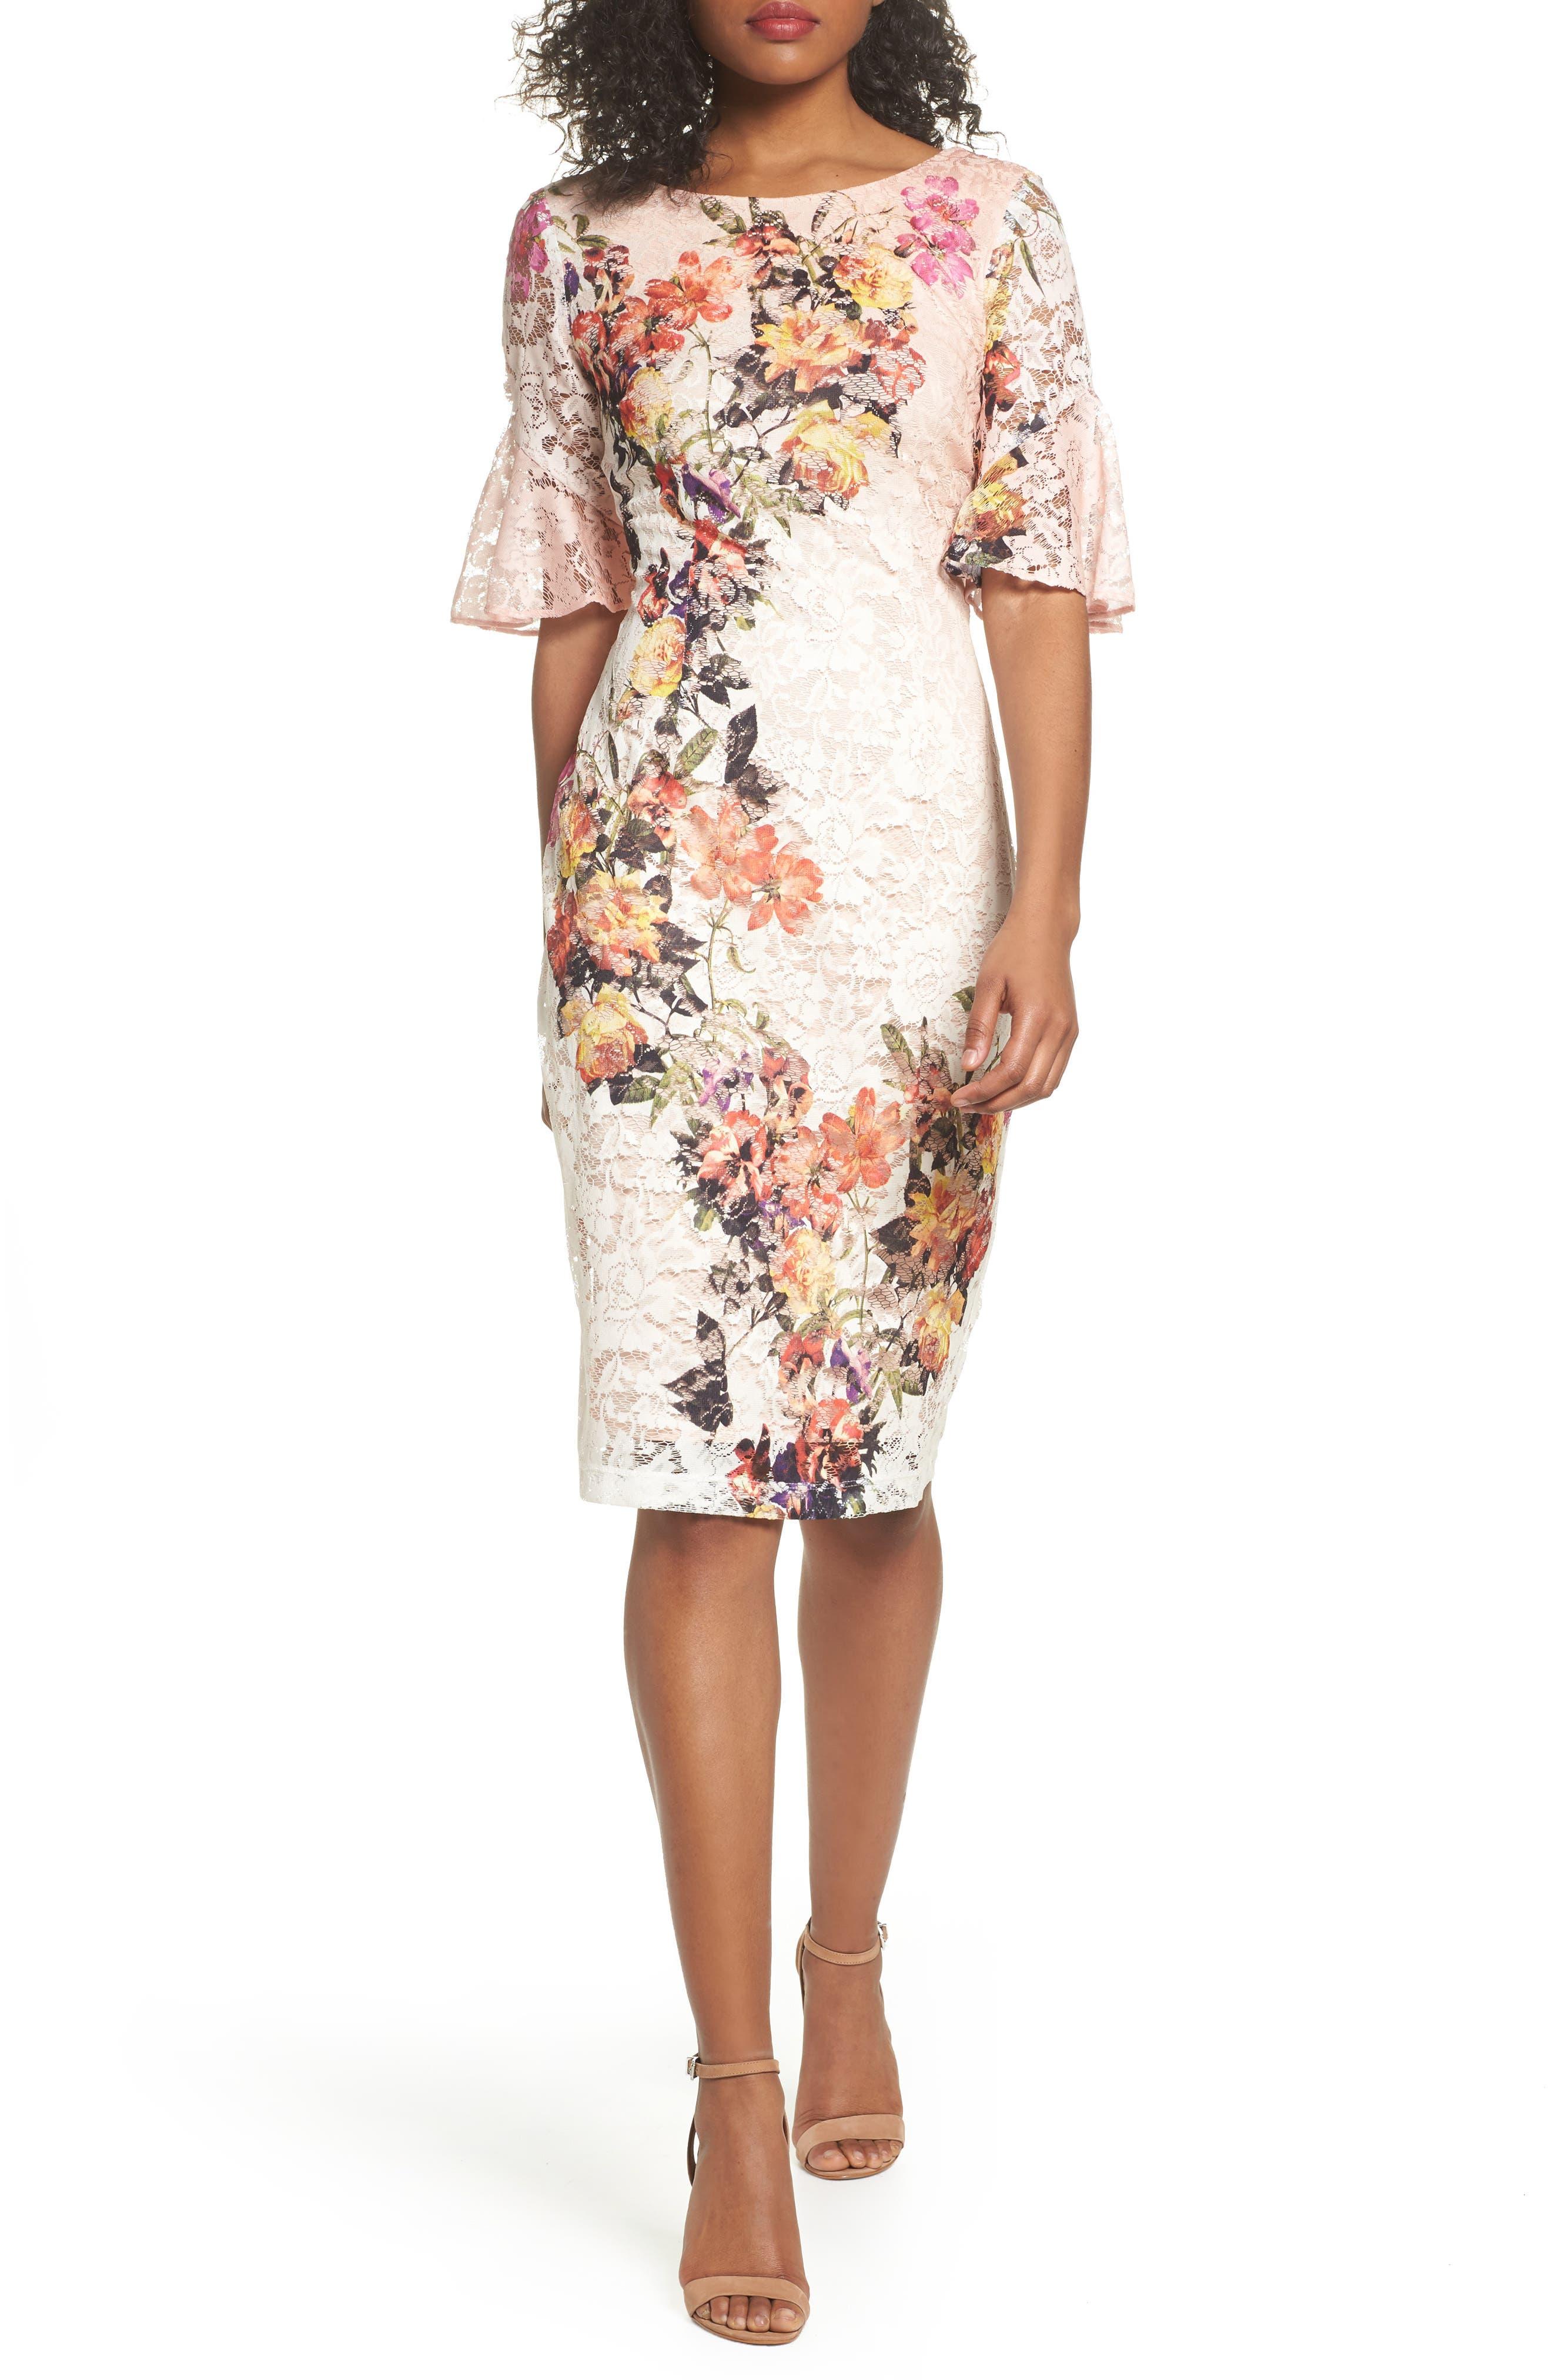 Gabby Skye Print Lace Sheath Dress